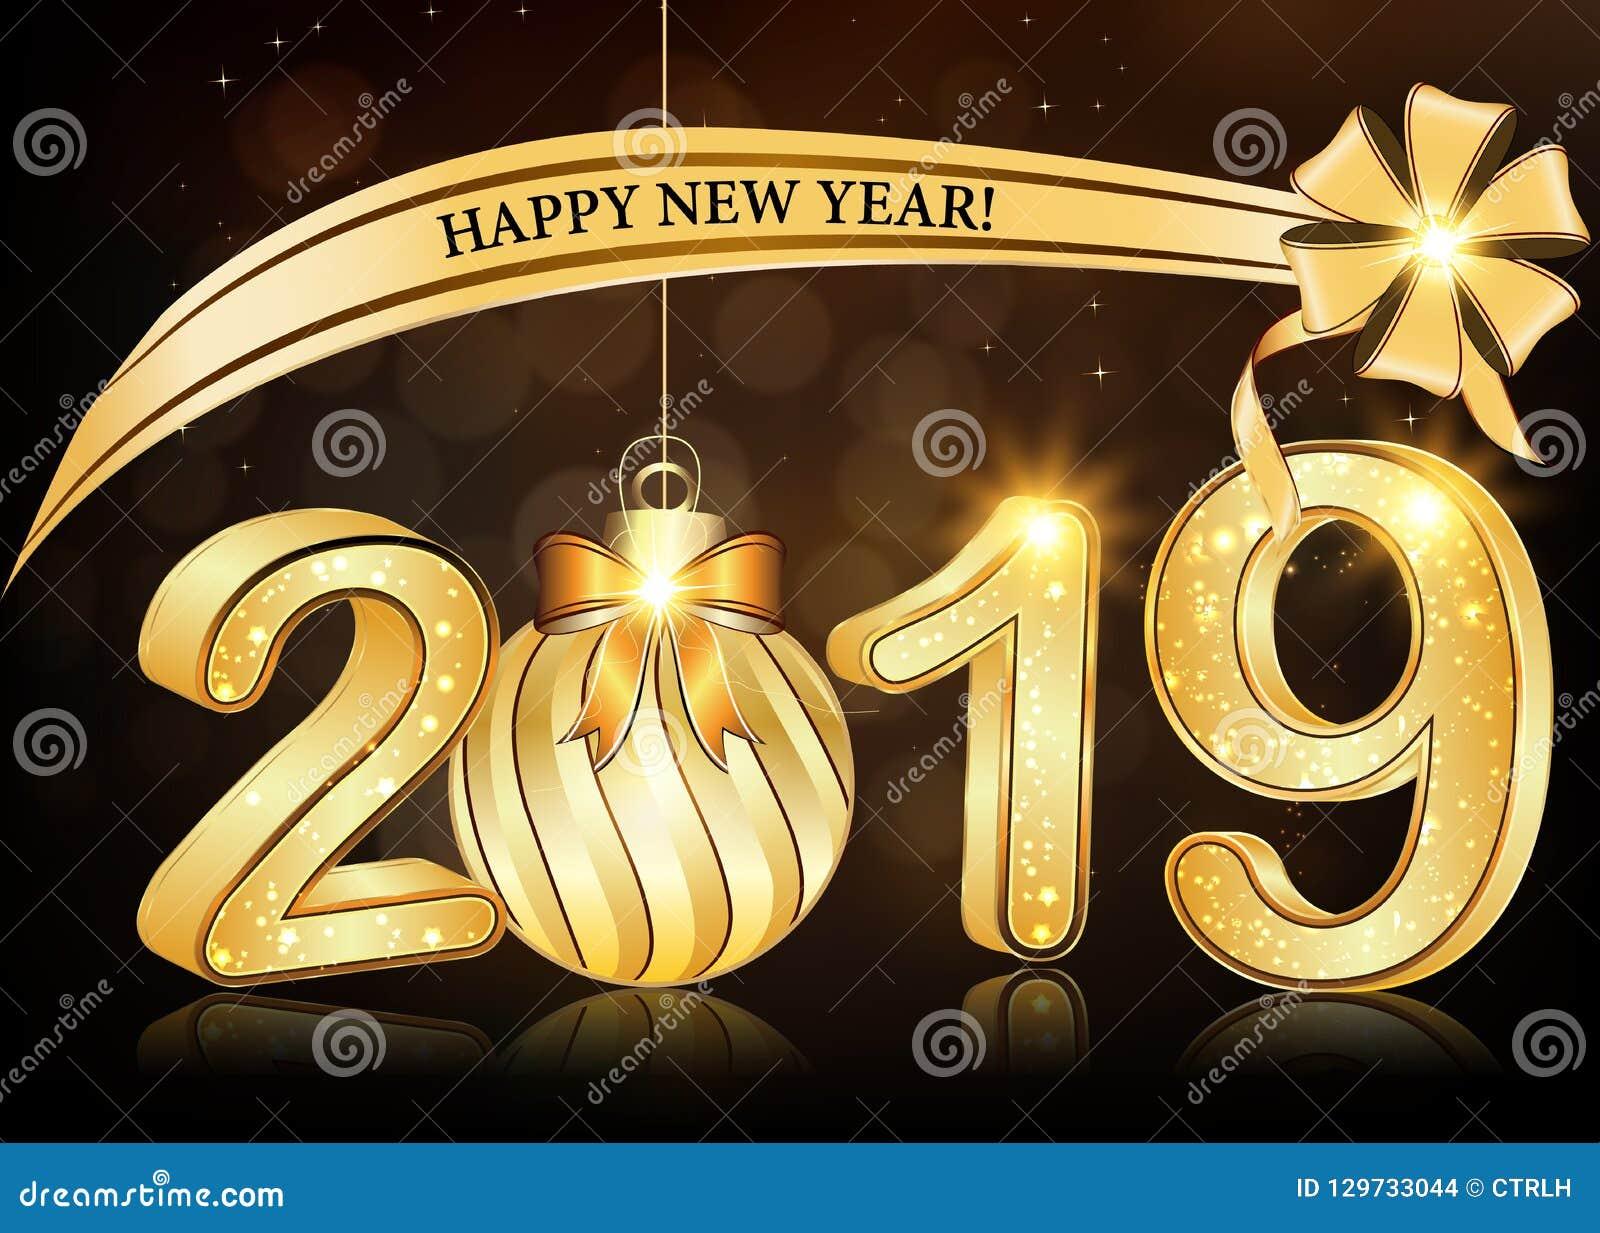 Happy New Year Elegant Images 10